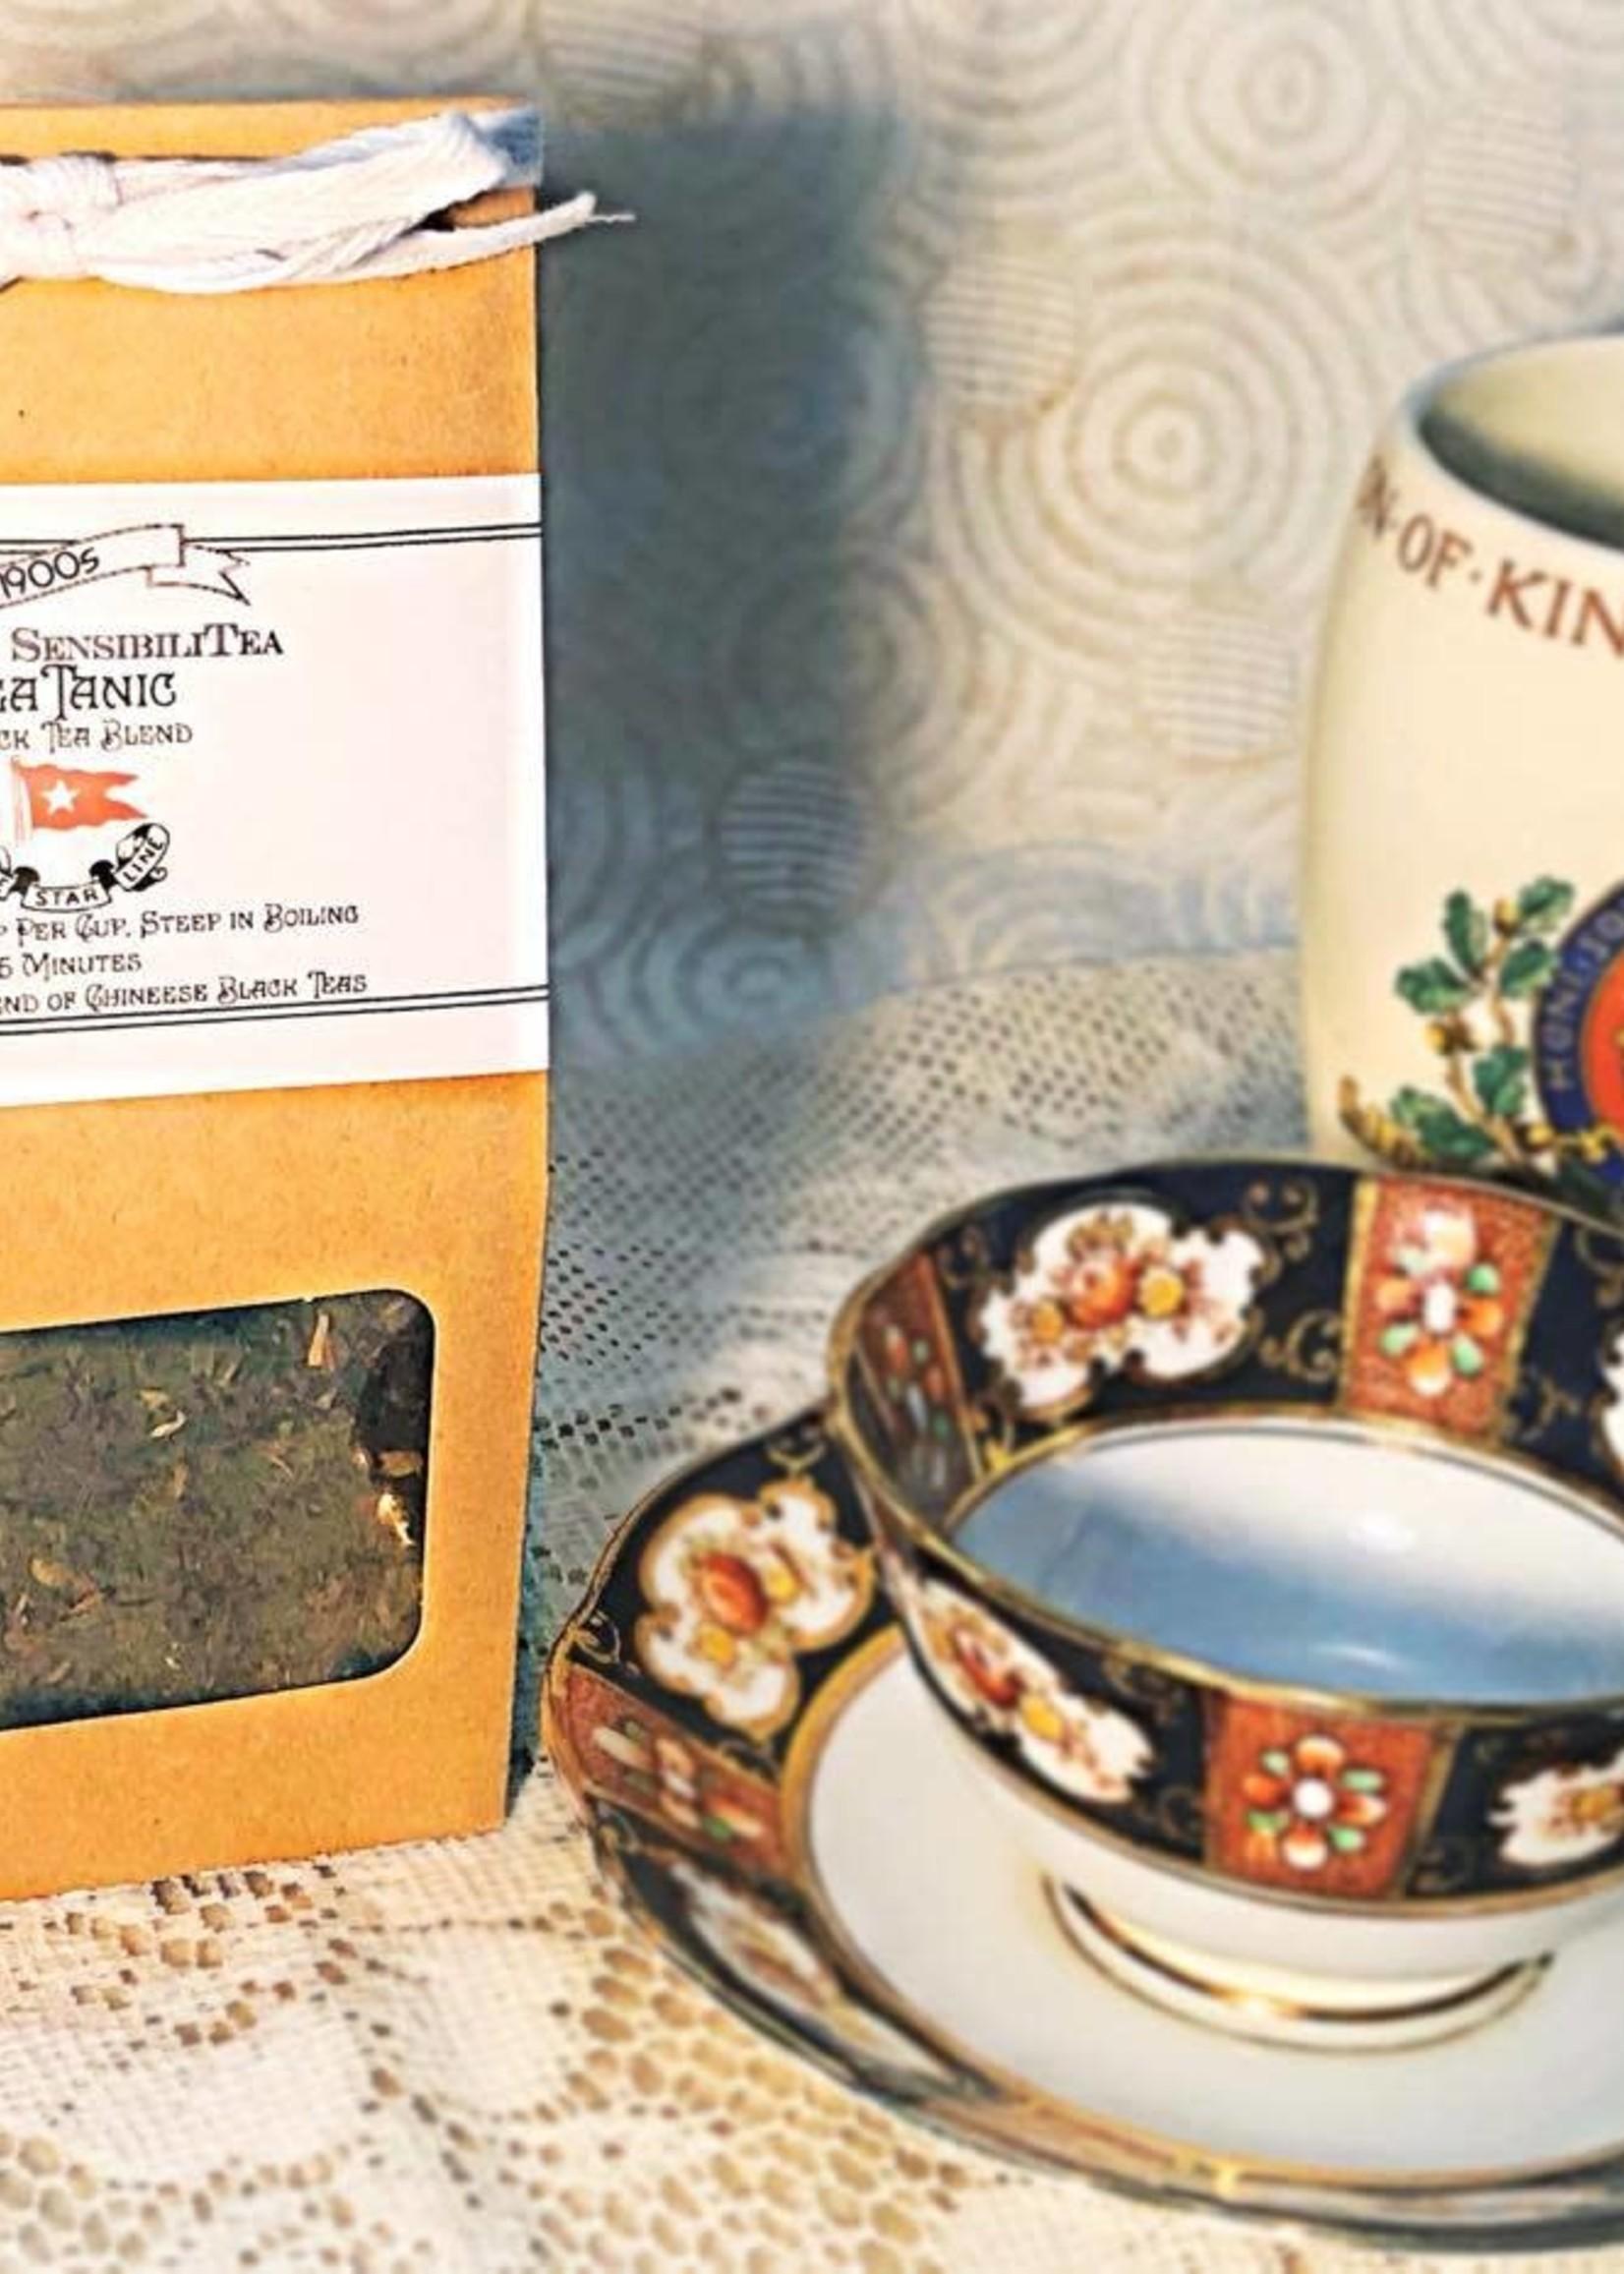 Sense and SensibiliTea 100g TeaTanic (Black Tea) – 1900s